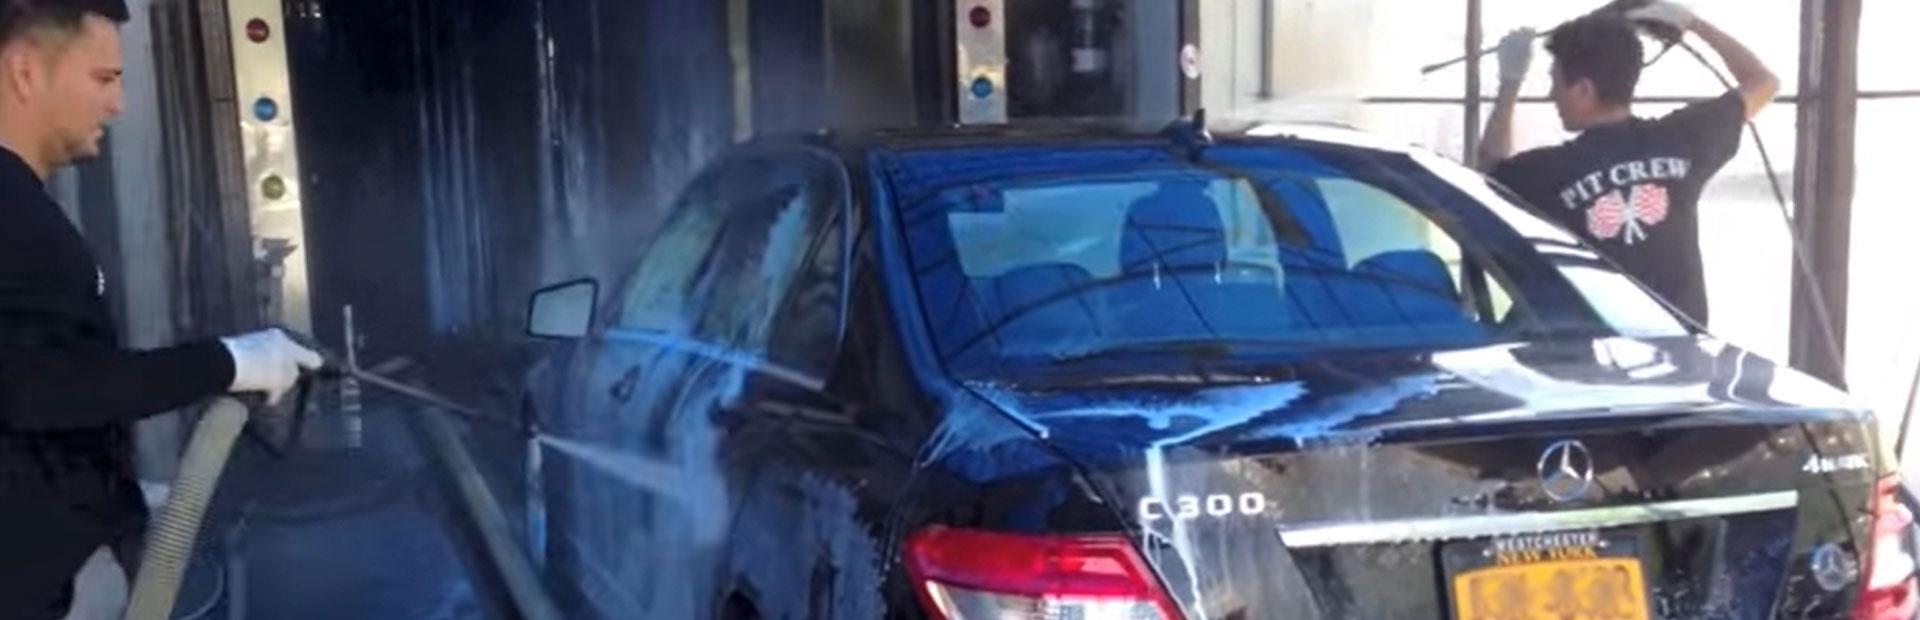 cross county car wash